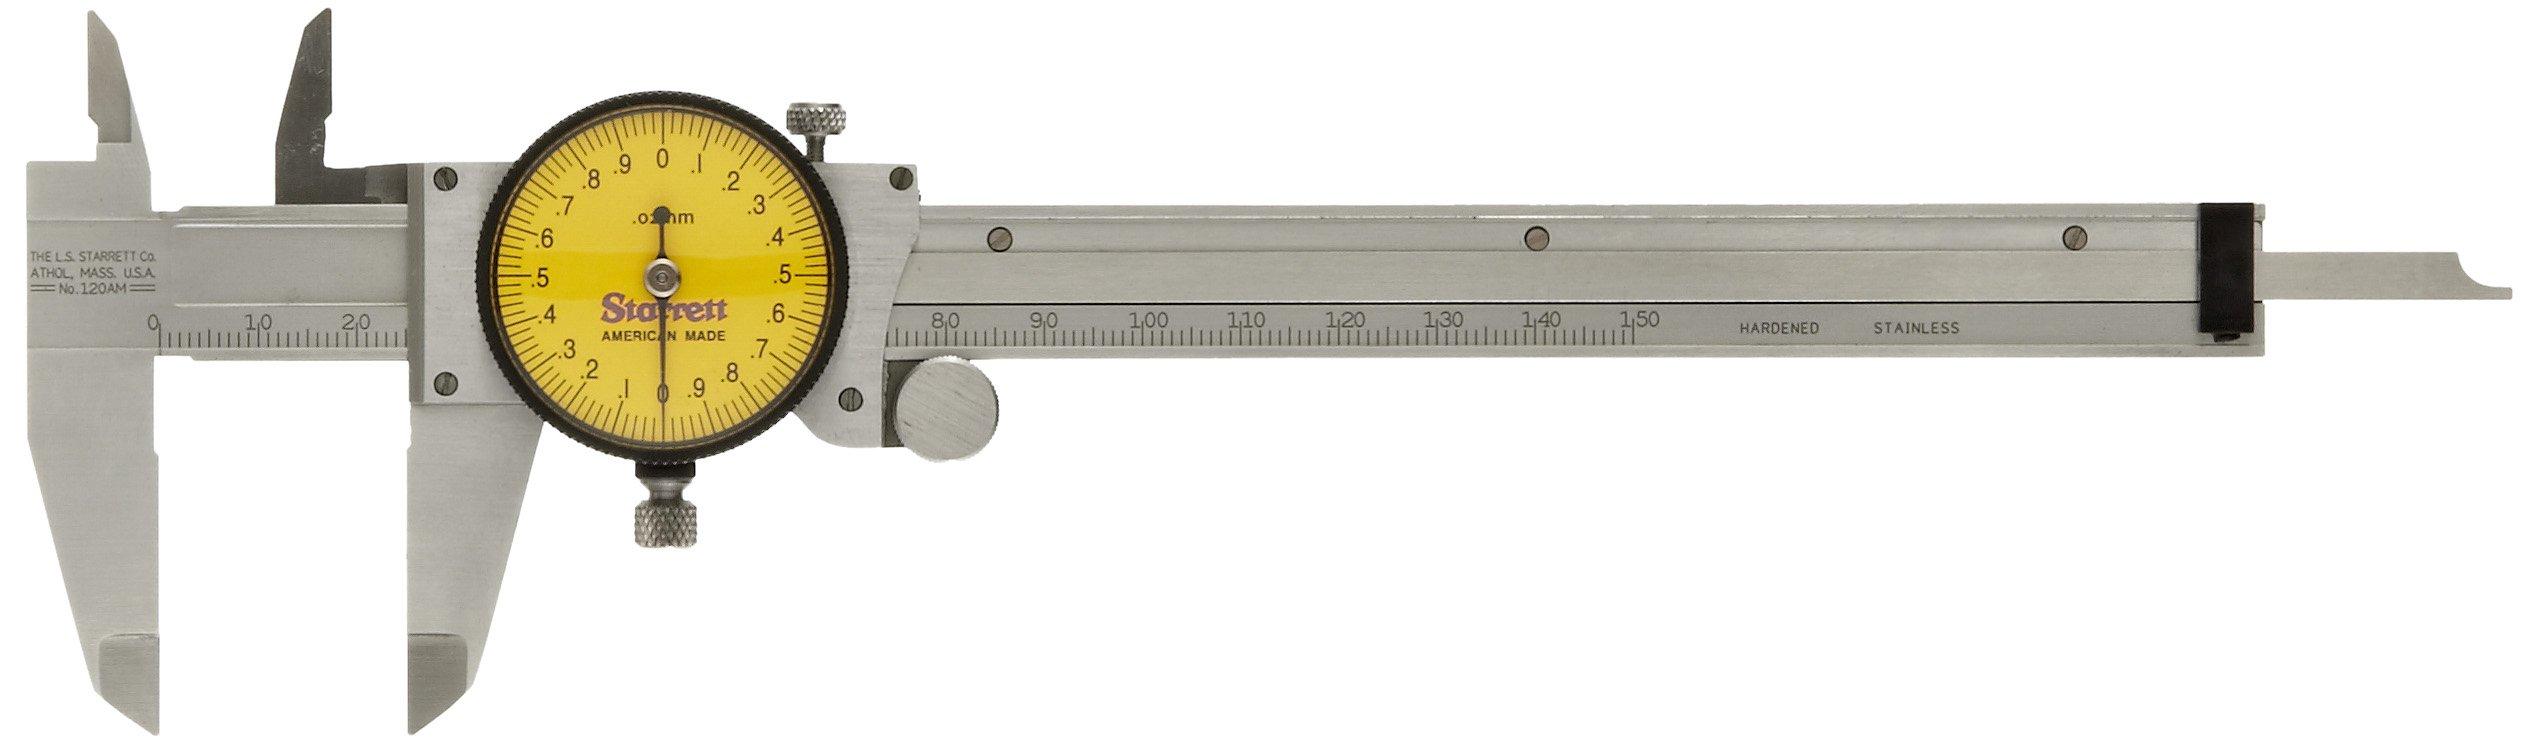 Starrett 120AM-150 Dial Caliper, Stainless Steel, Yellow Face, 0-150mm Range, +/-0.03mm Accuracy, 0.02mm Resolution by Starrett